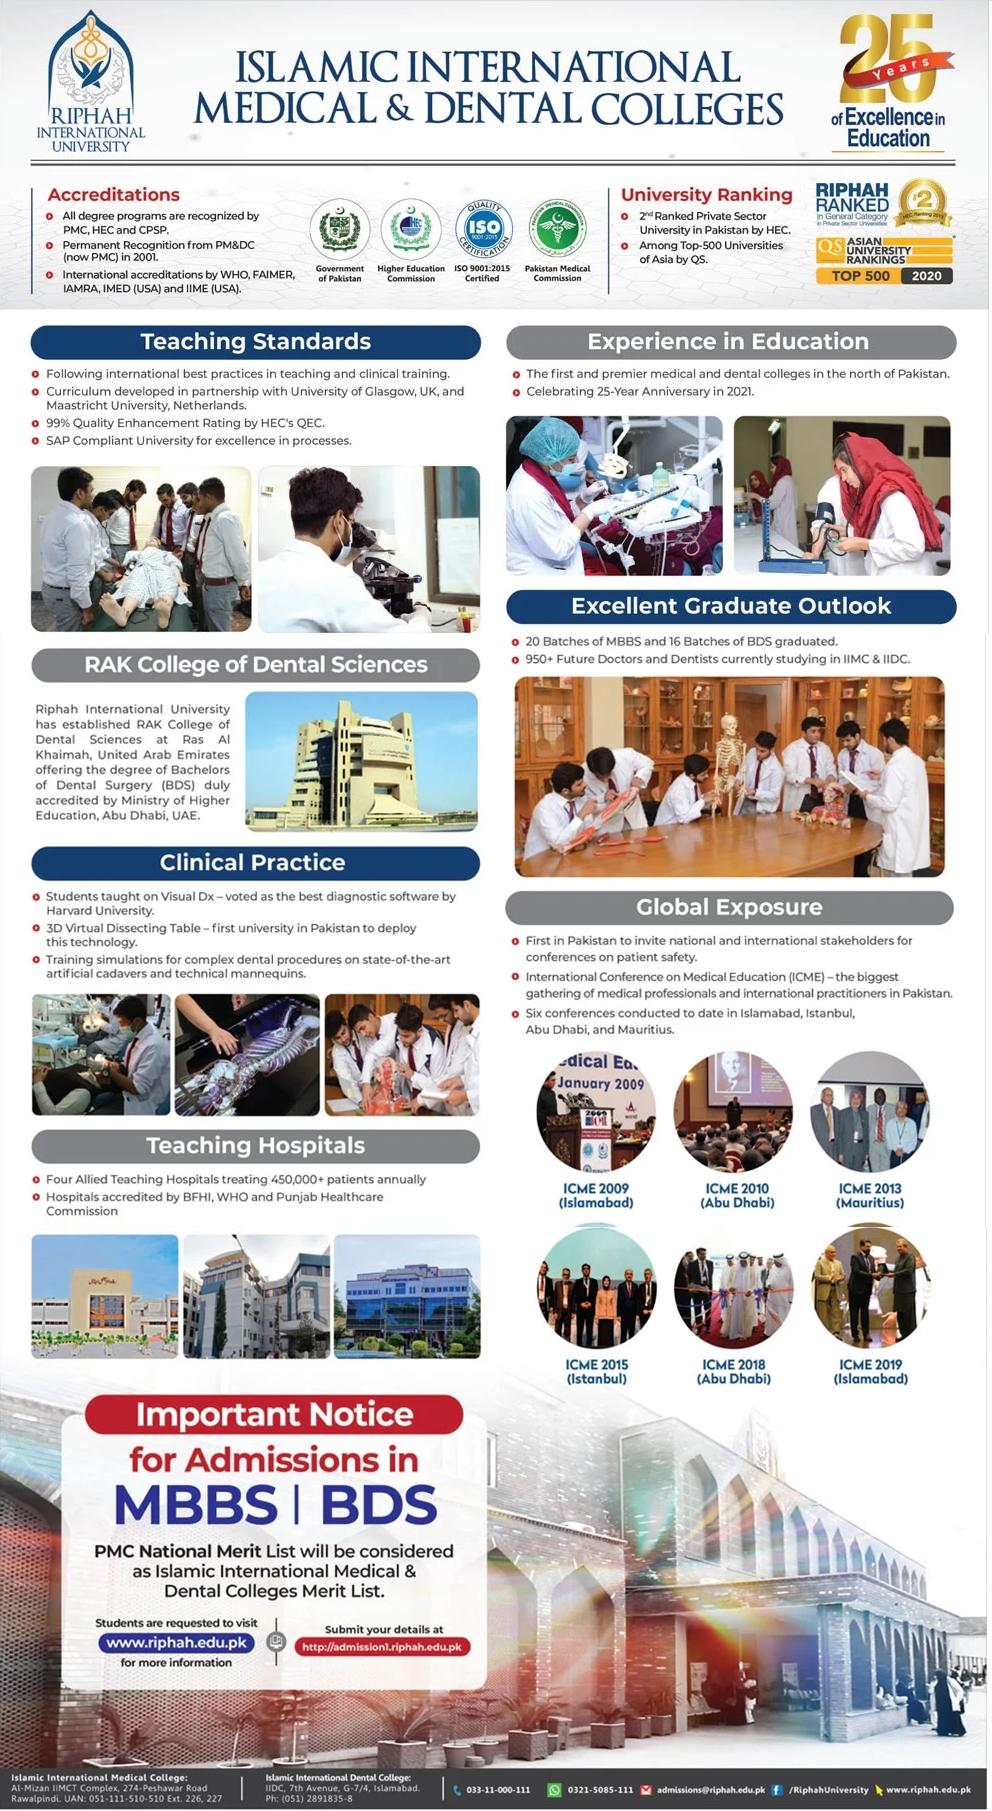 Islamic International Medical College IIMC MBBS & BDS Admission 2021